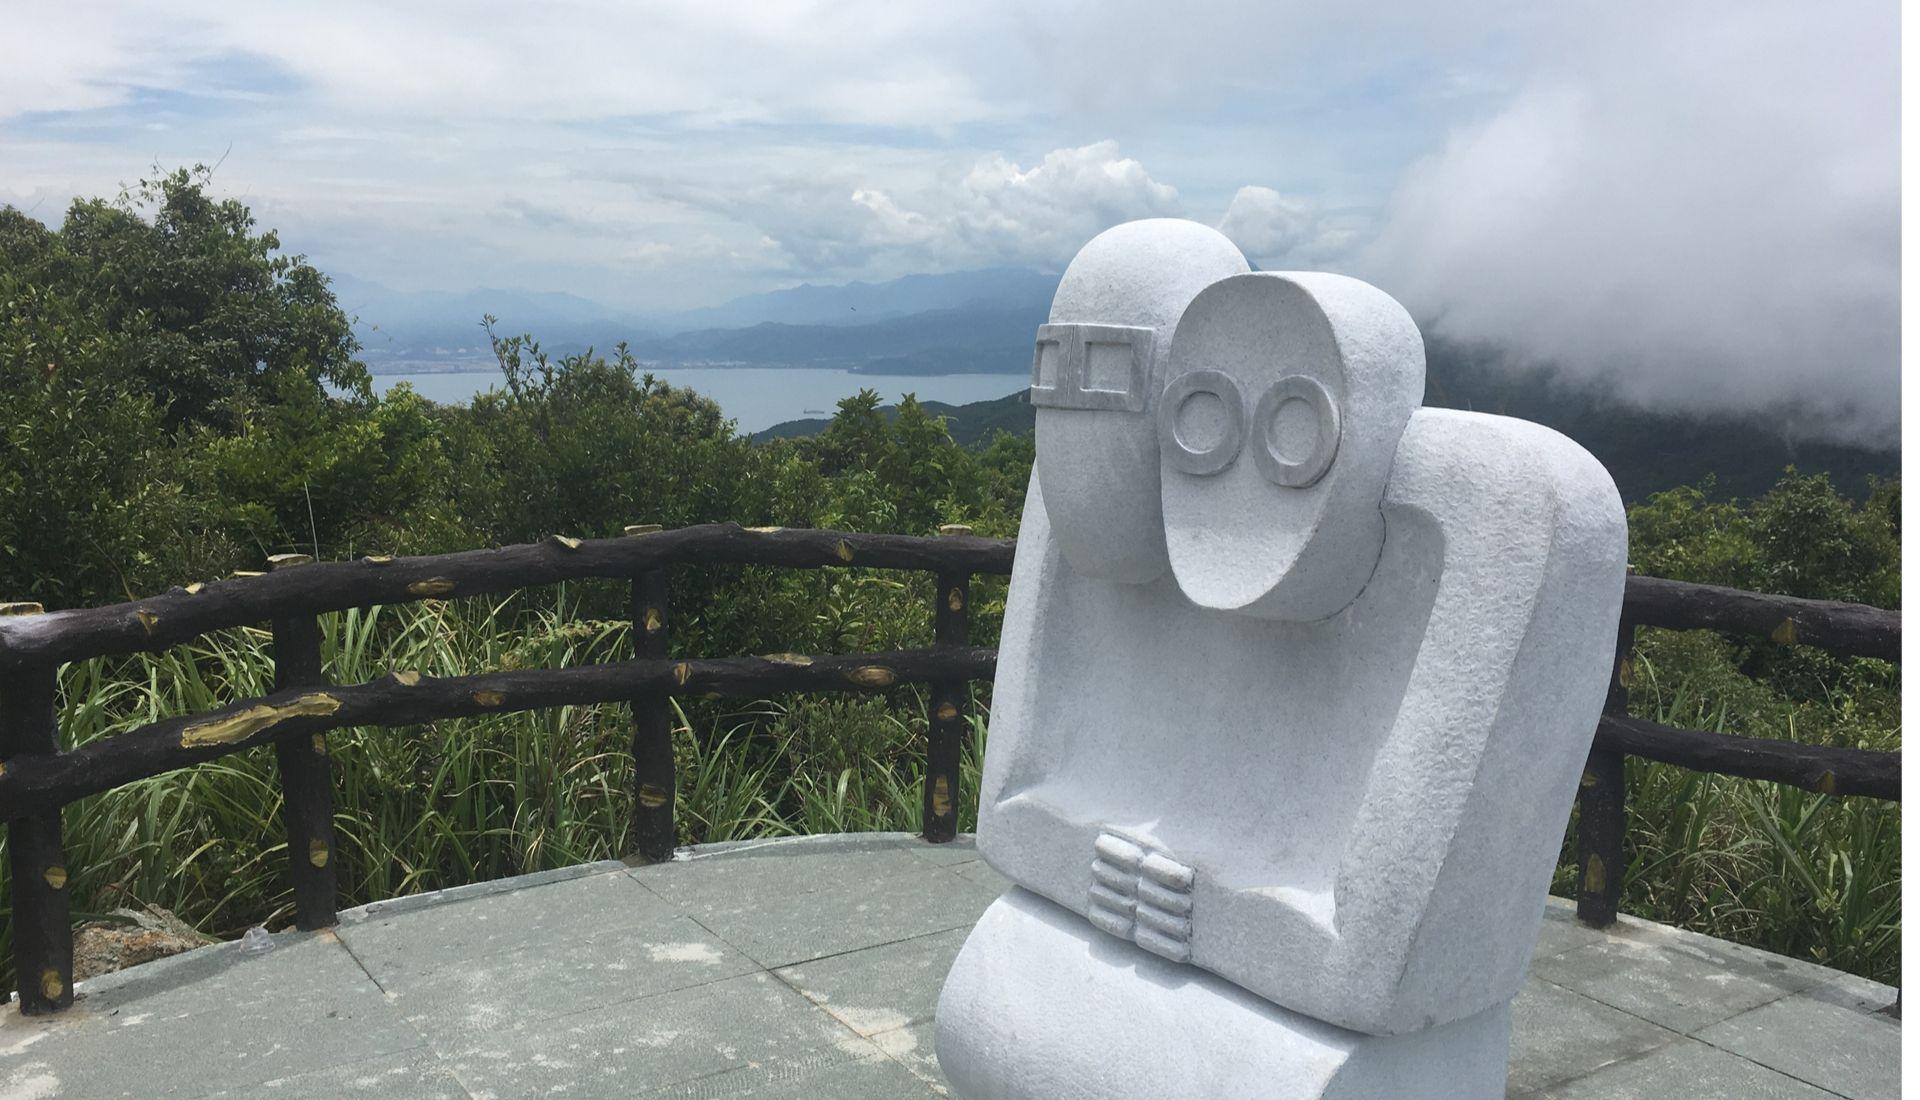 Monkeys (stone statues) Monkey Mountain